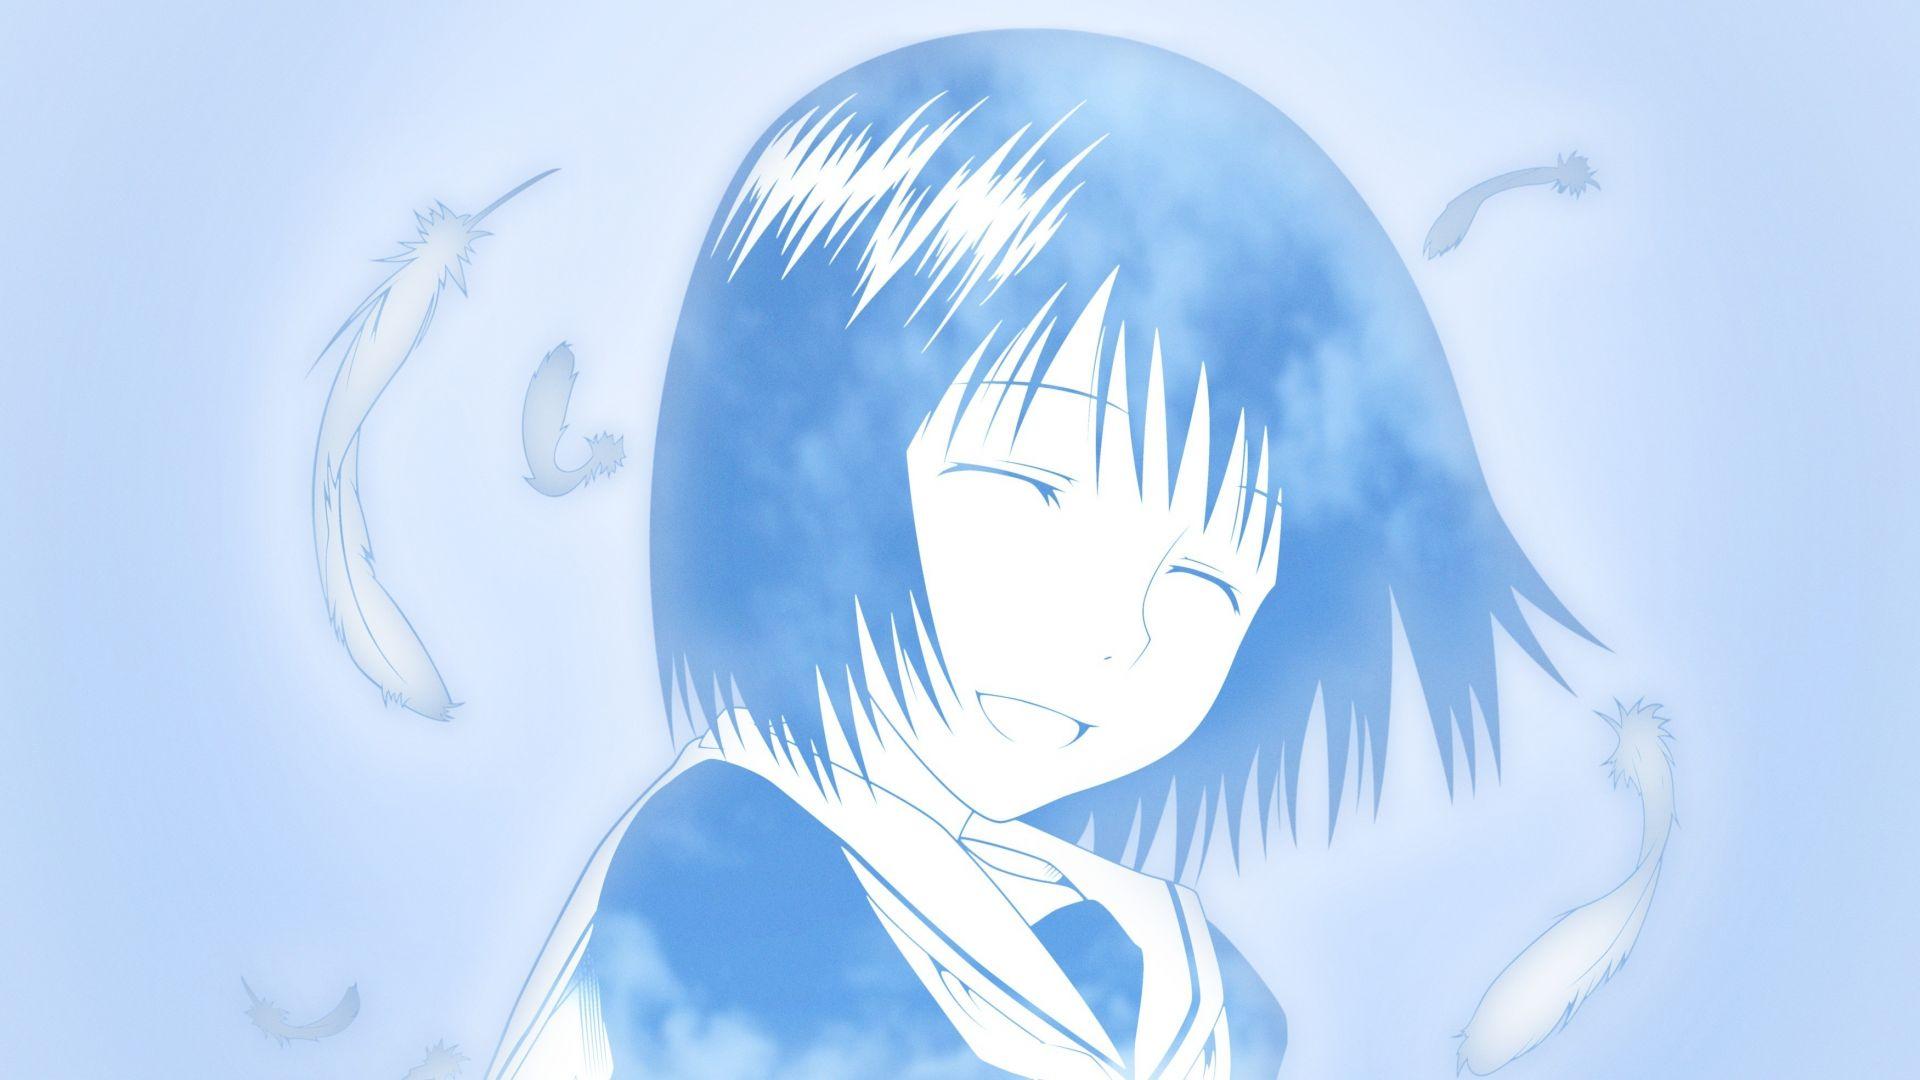 Wallpaper Cute, smile, Misaki Nakahara, anime girl